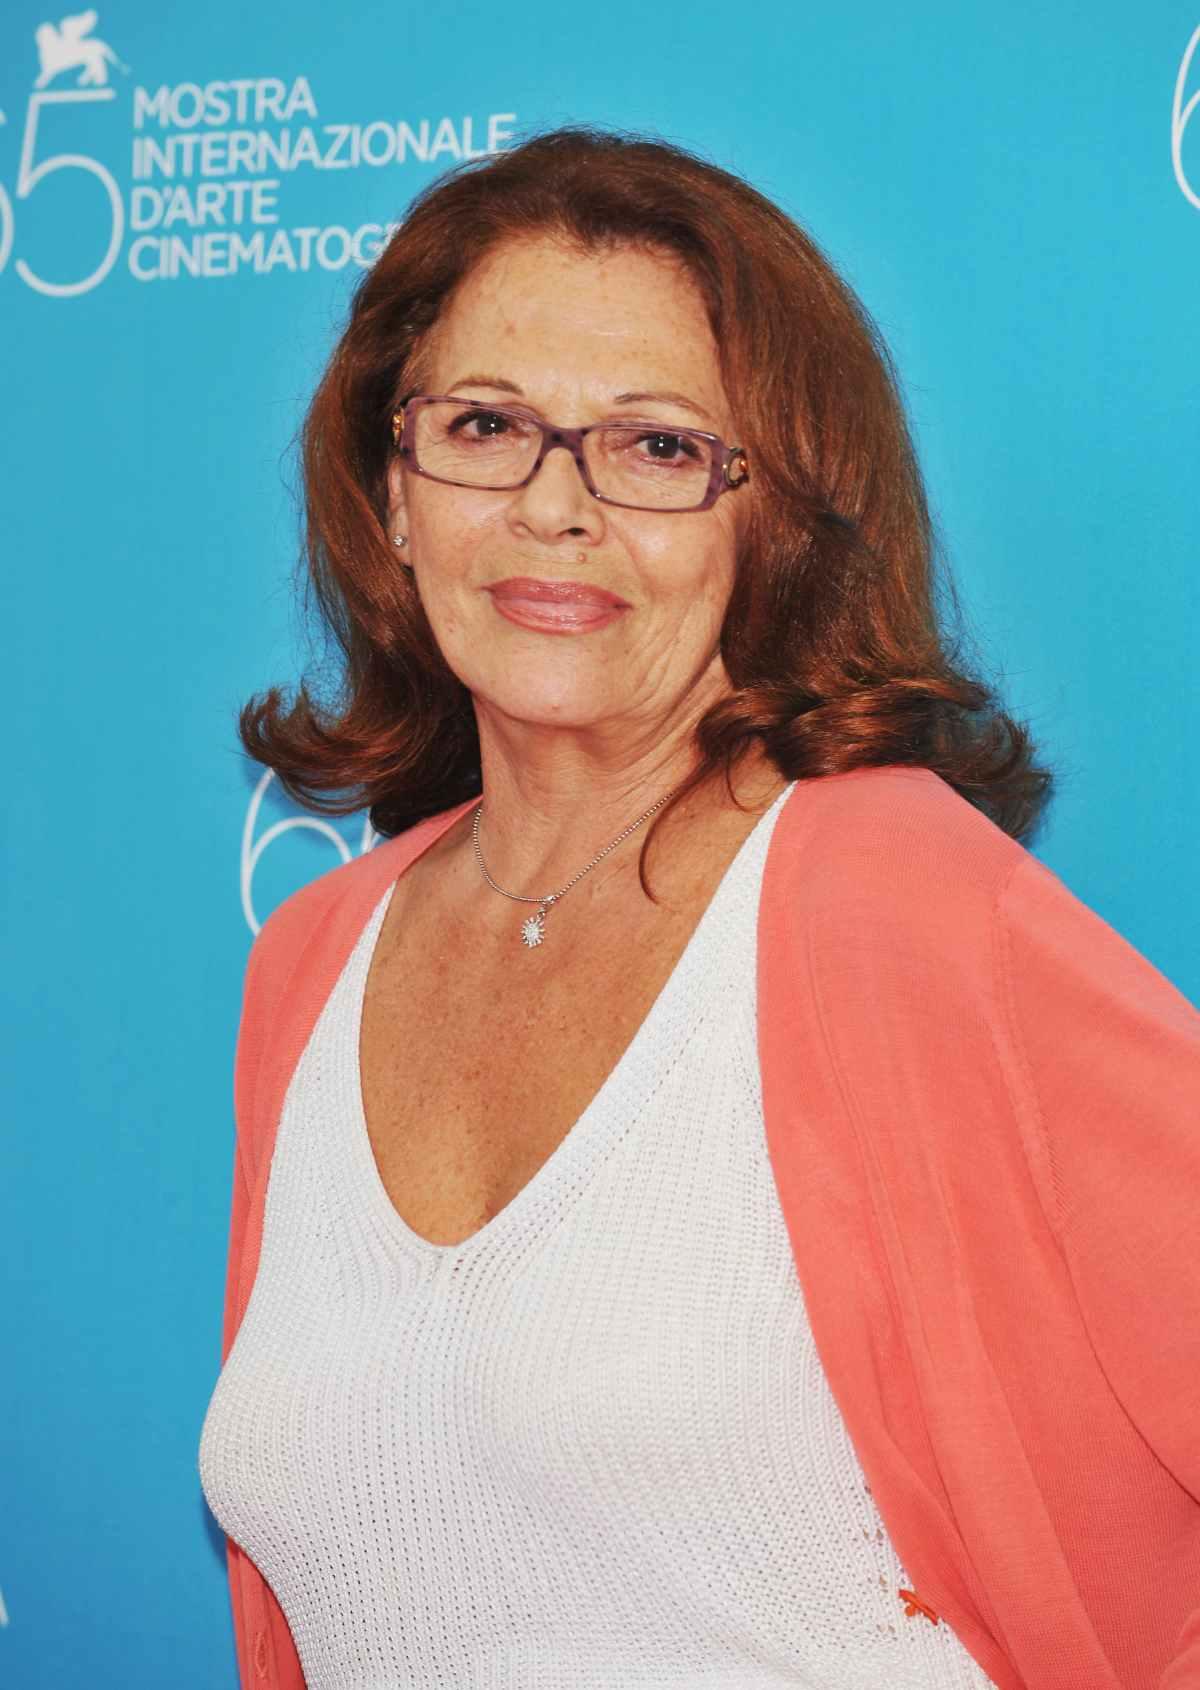 Valeria Fabrizi (Getty Images)